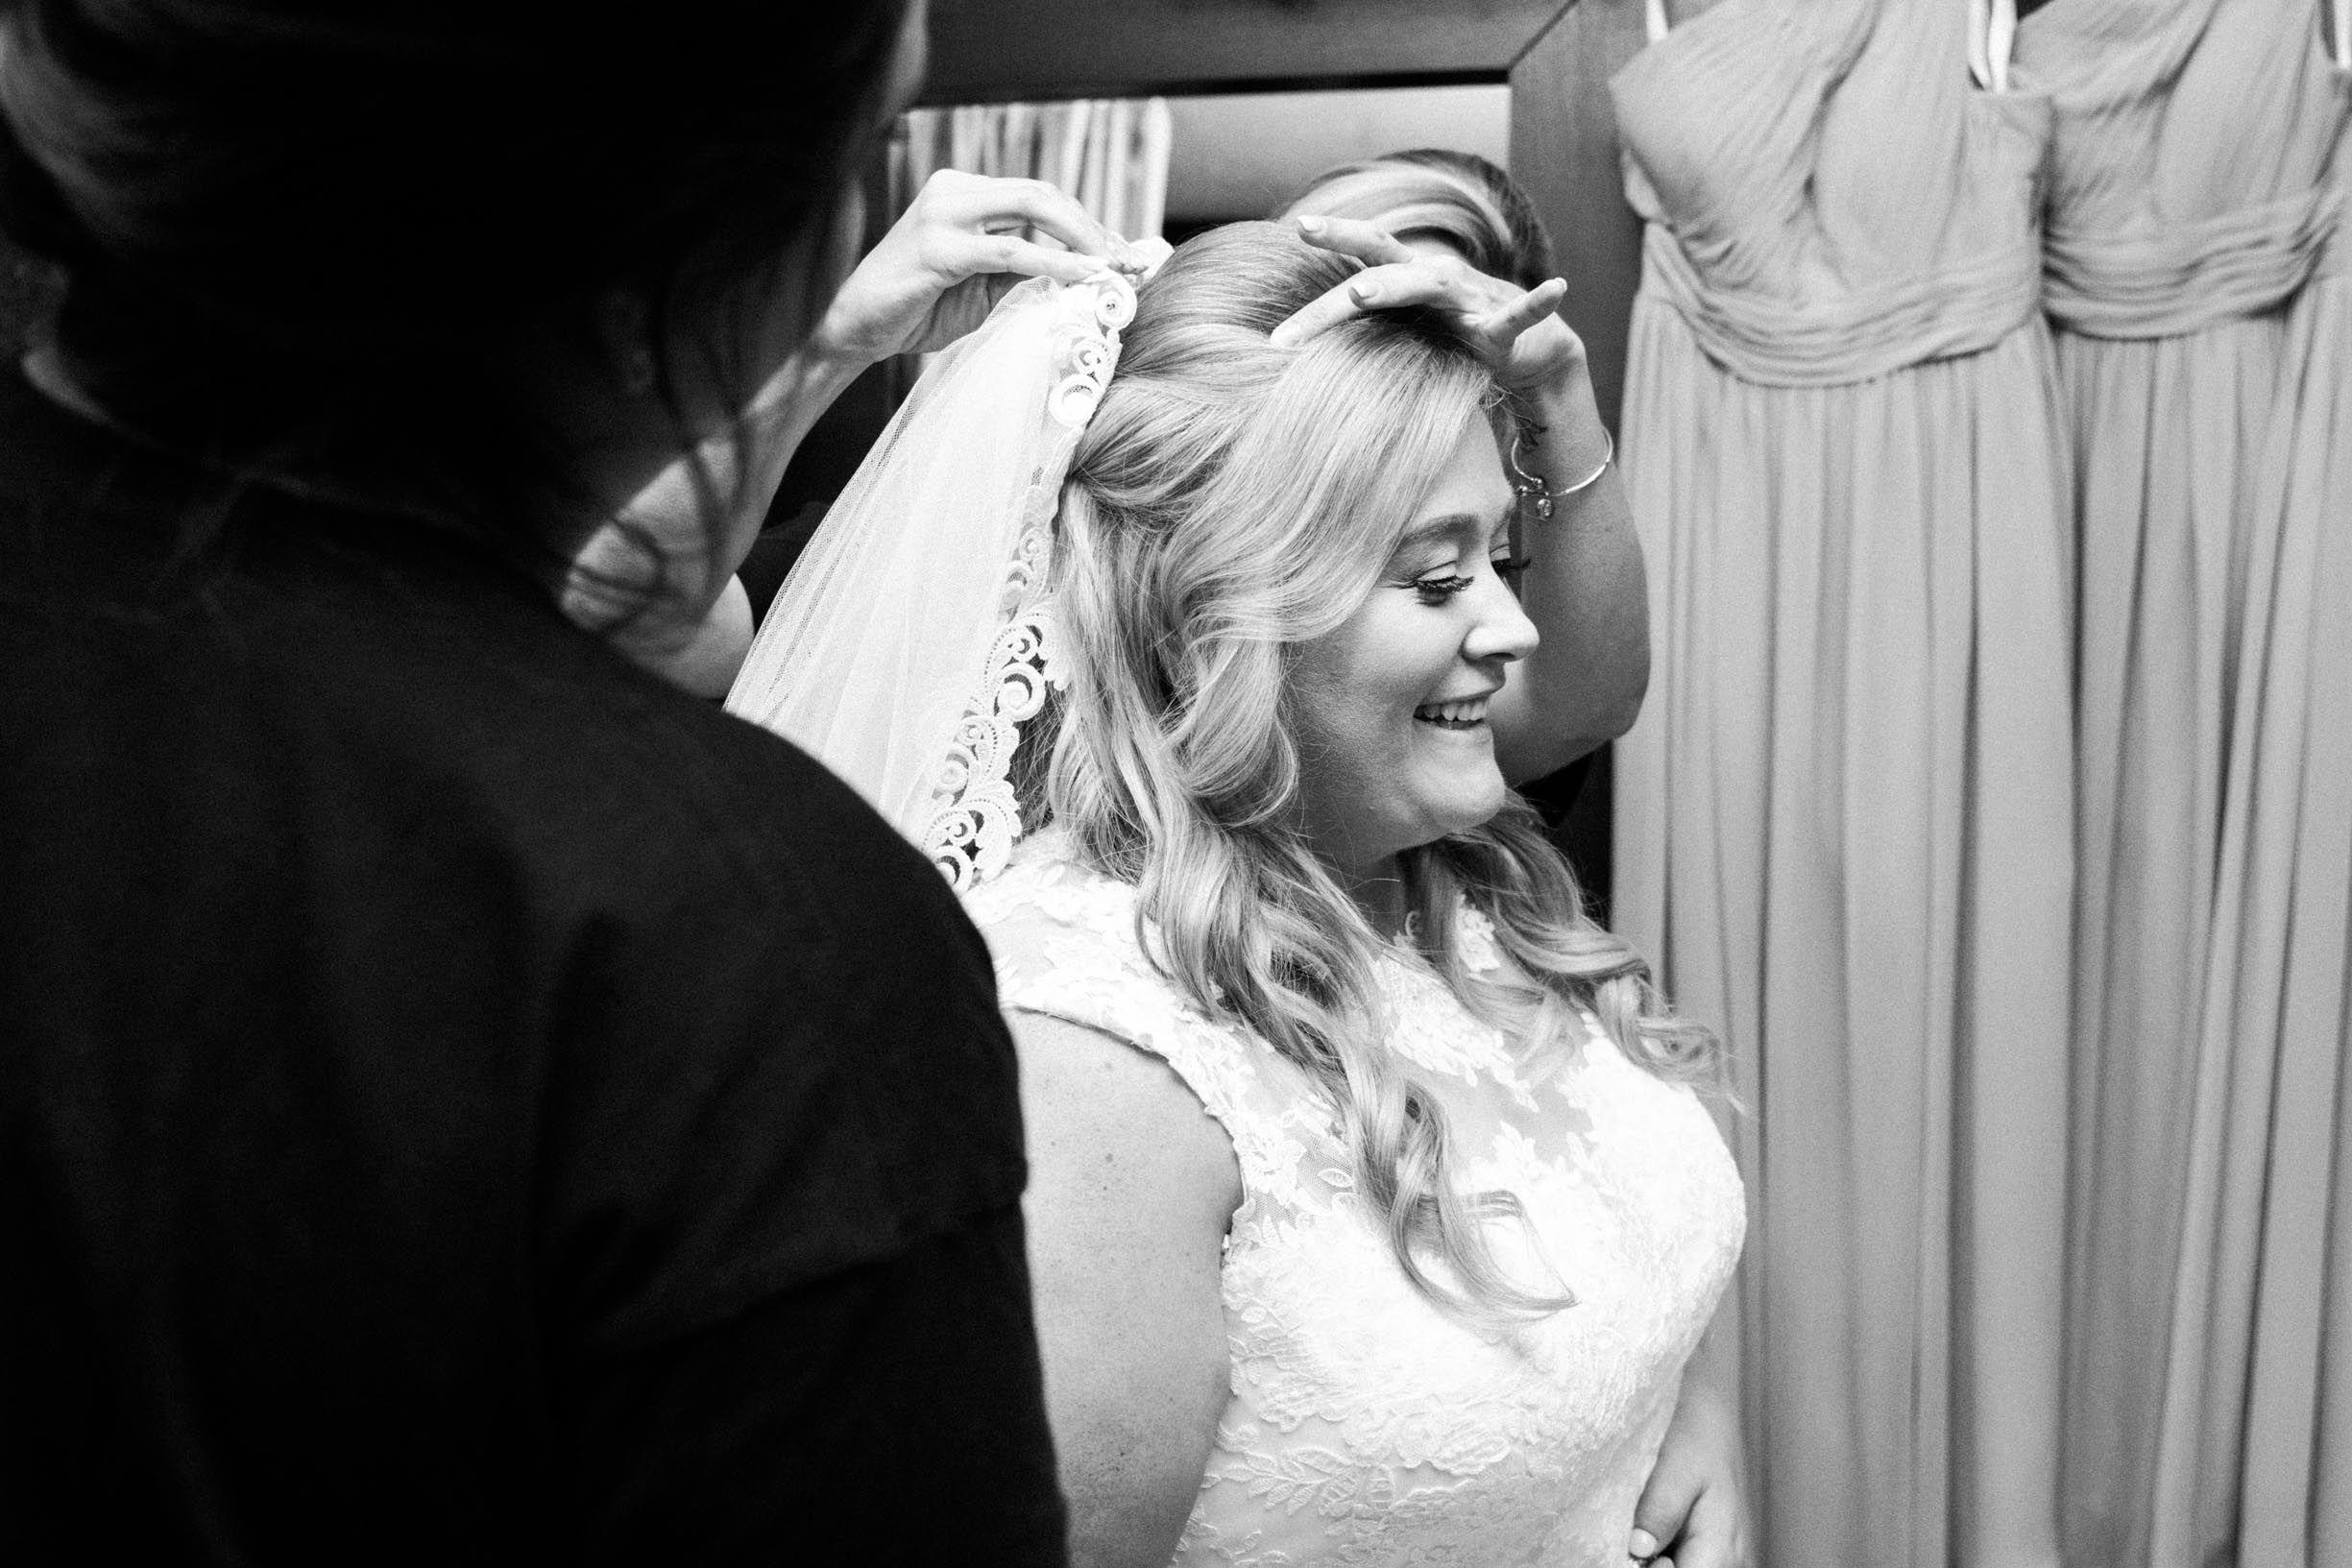 Black And White Getting Ready Portrait Mayowood Stone Barn Rochester Mn California Wedding Photography Wedding Photography And Videography Bride Getting Ready